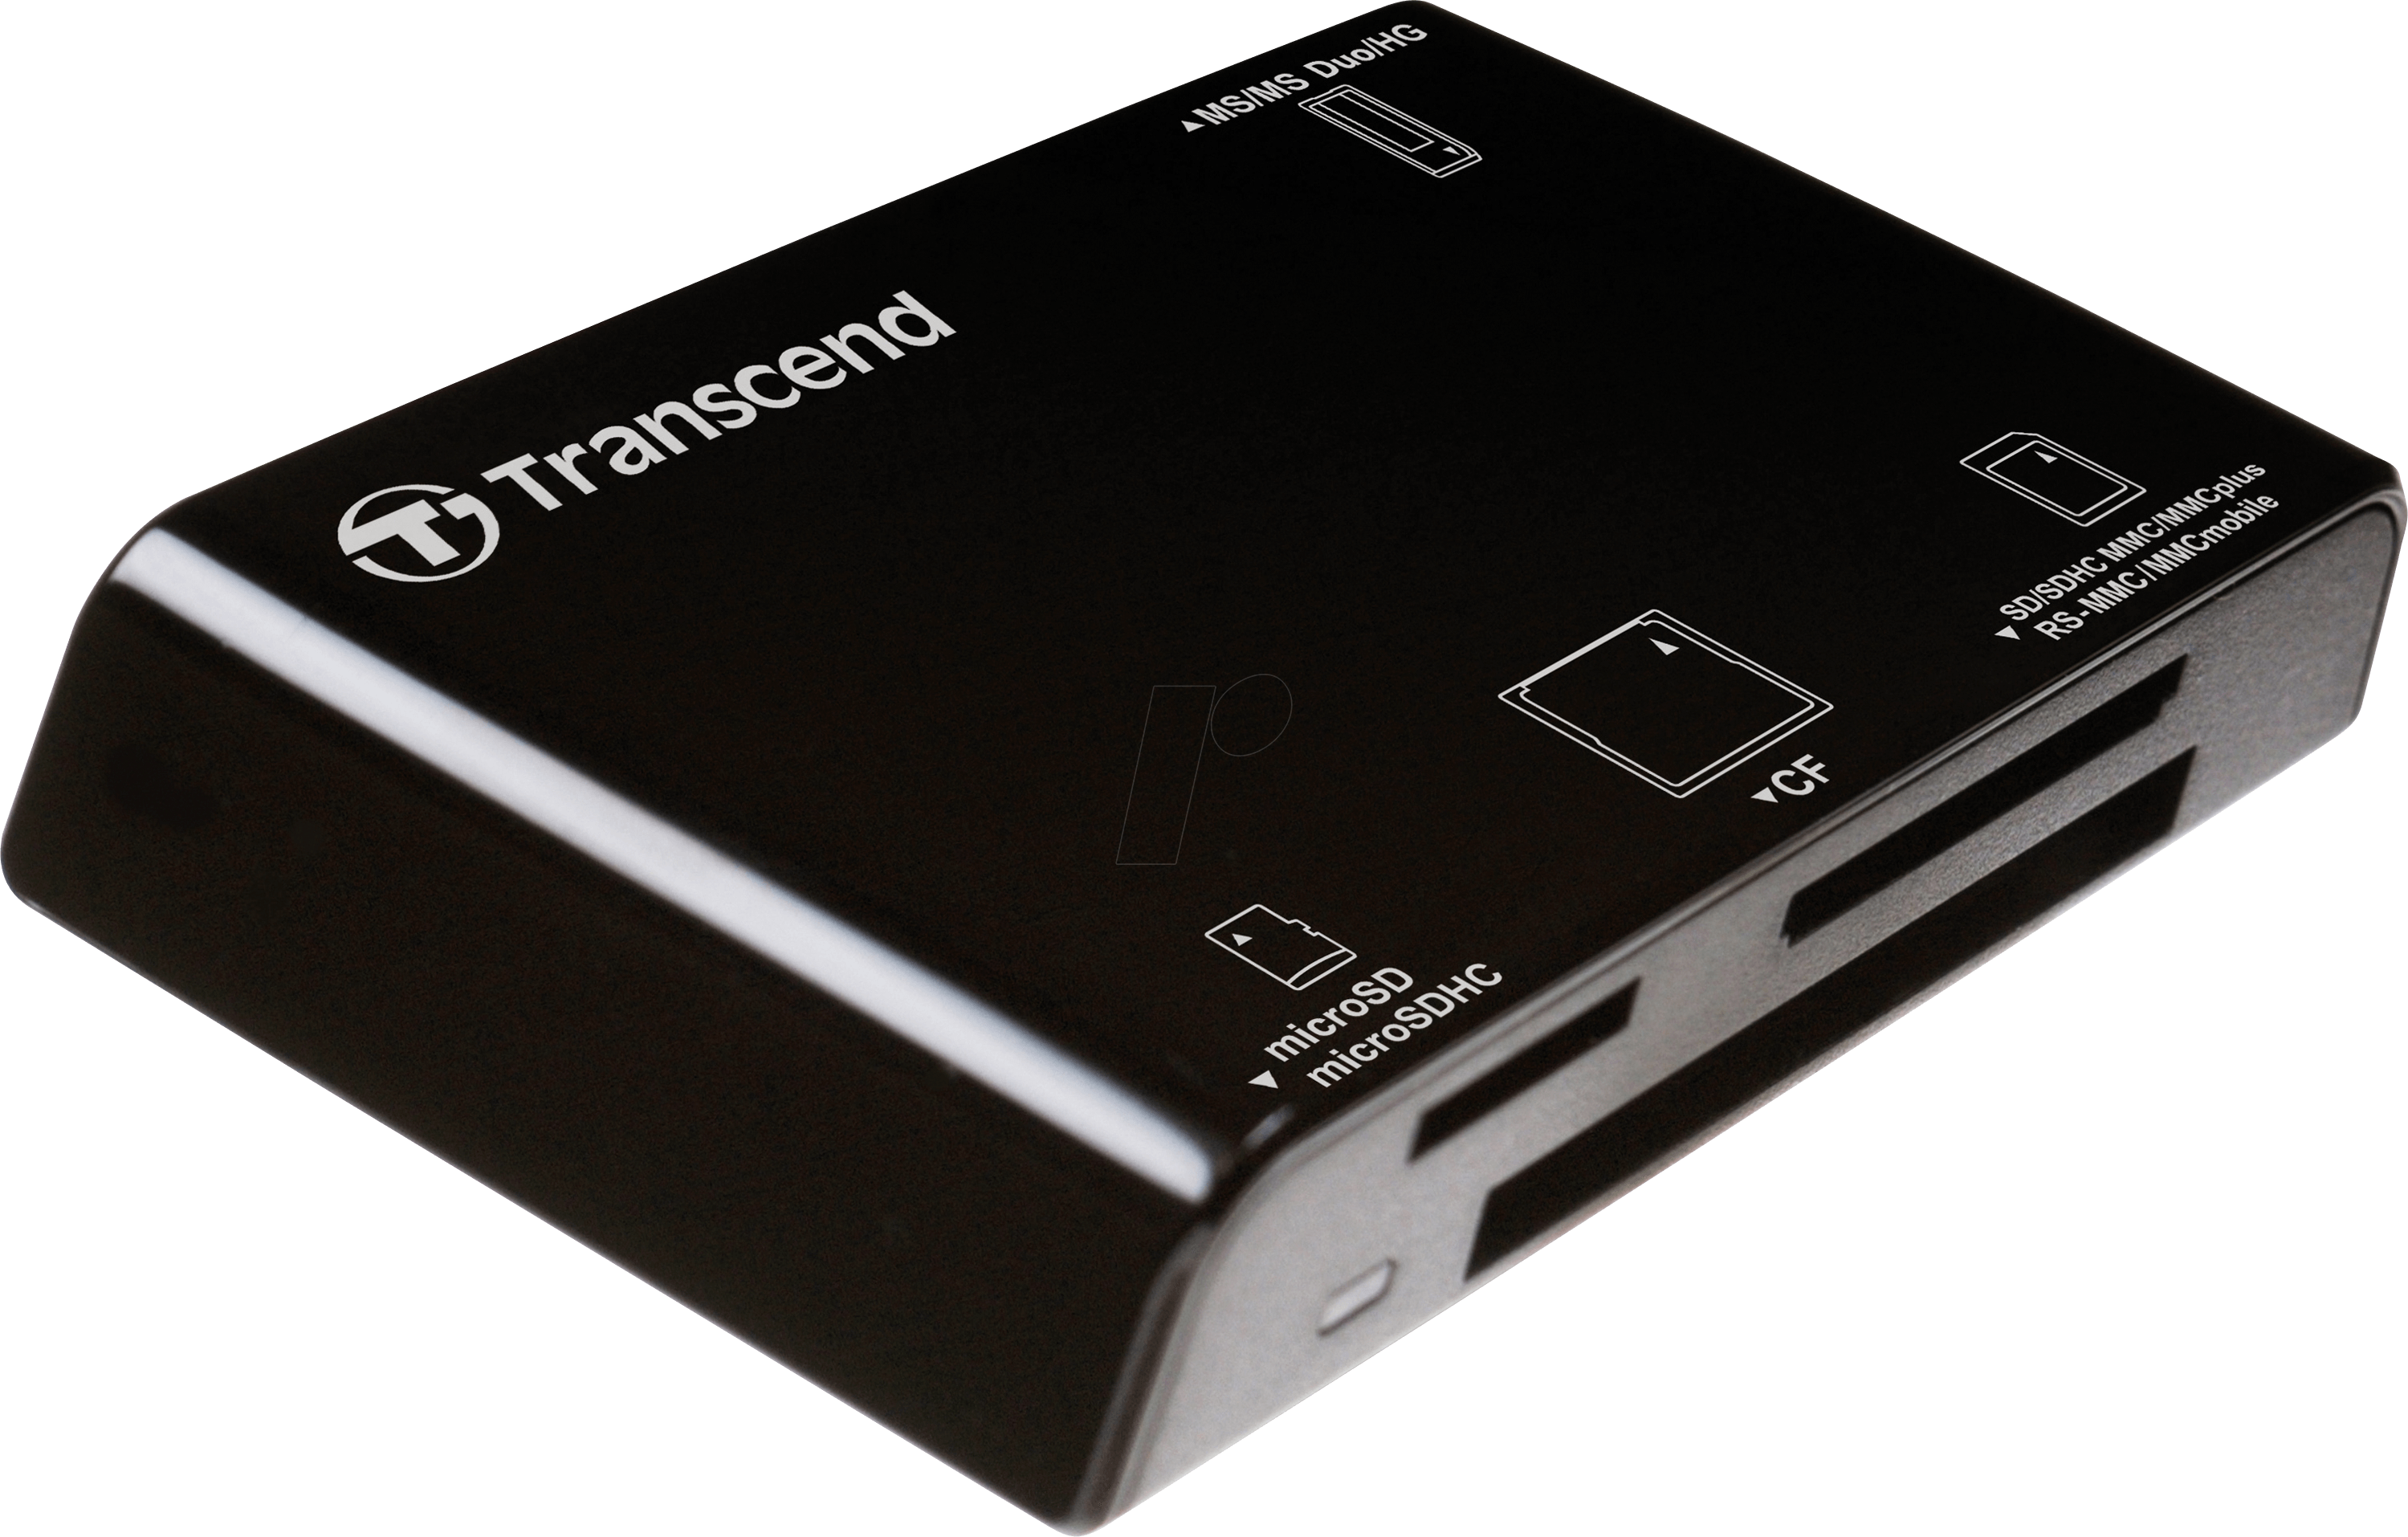 Ts Rdp8k Card Reader External Usb 20 Sd Microsd Compact Flash Transcend